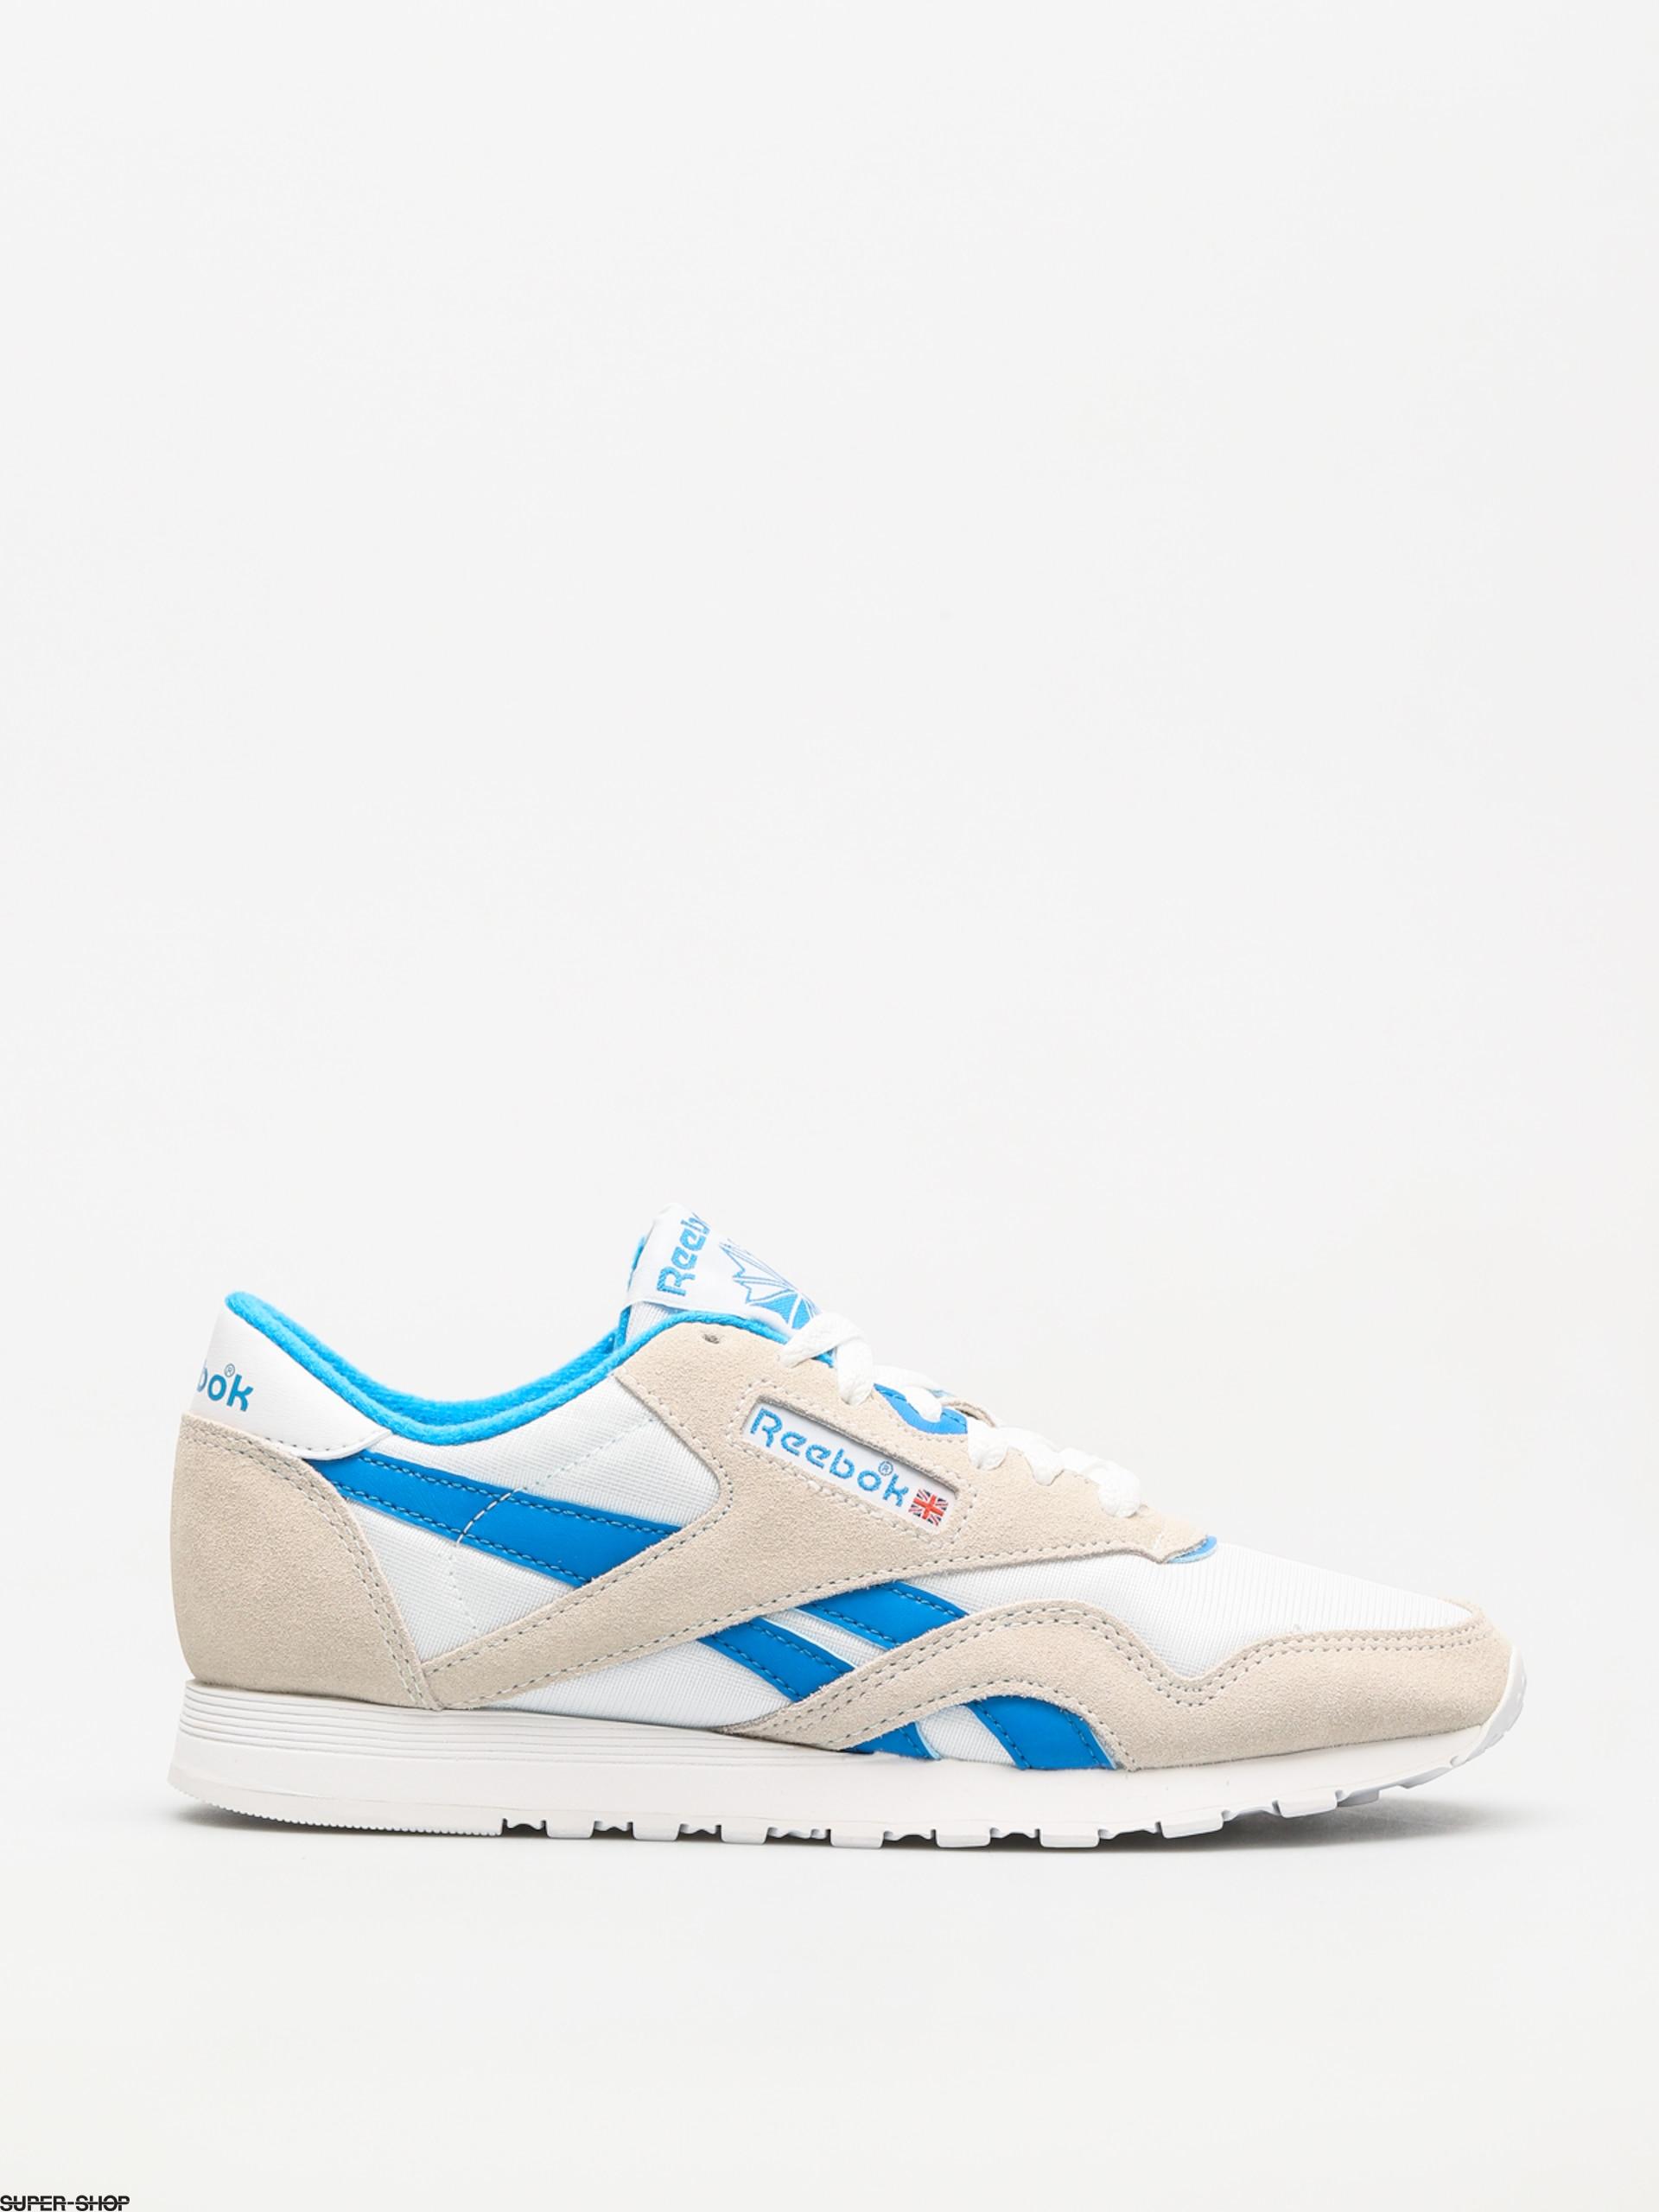 competitive price e212c bab17 Reebok Schuhe Cl Nylon Wmn (archive white/cycle blue)